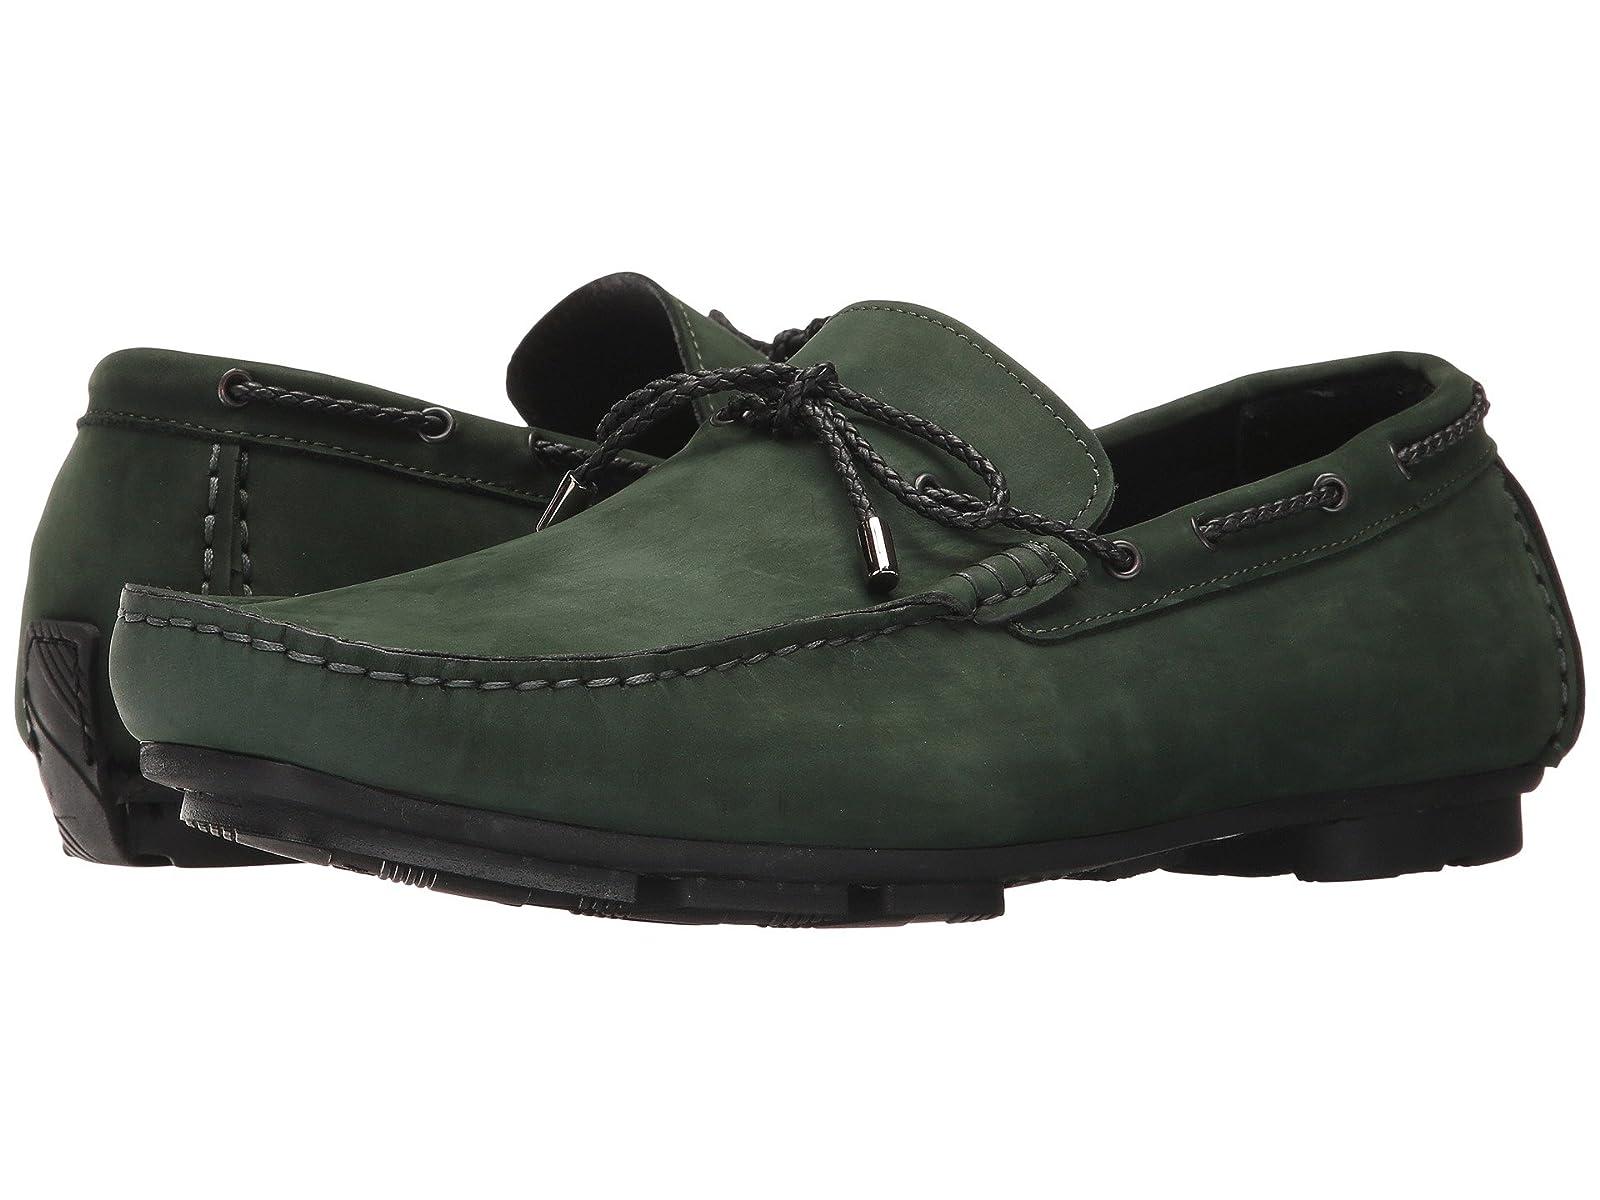 BUGATCHI Montalcino DriverCheap and distinctive eye-catching shoes